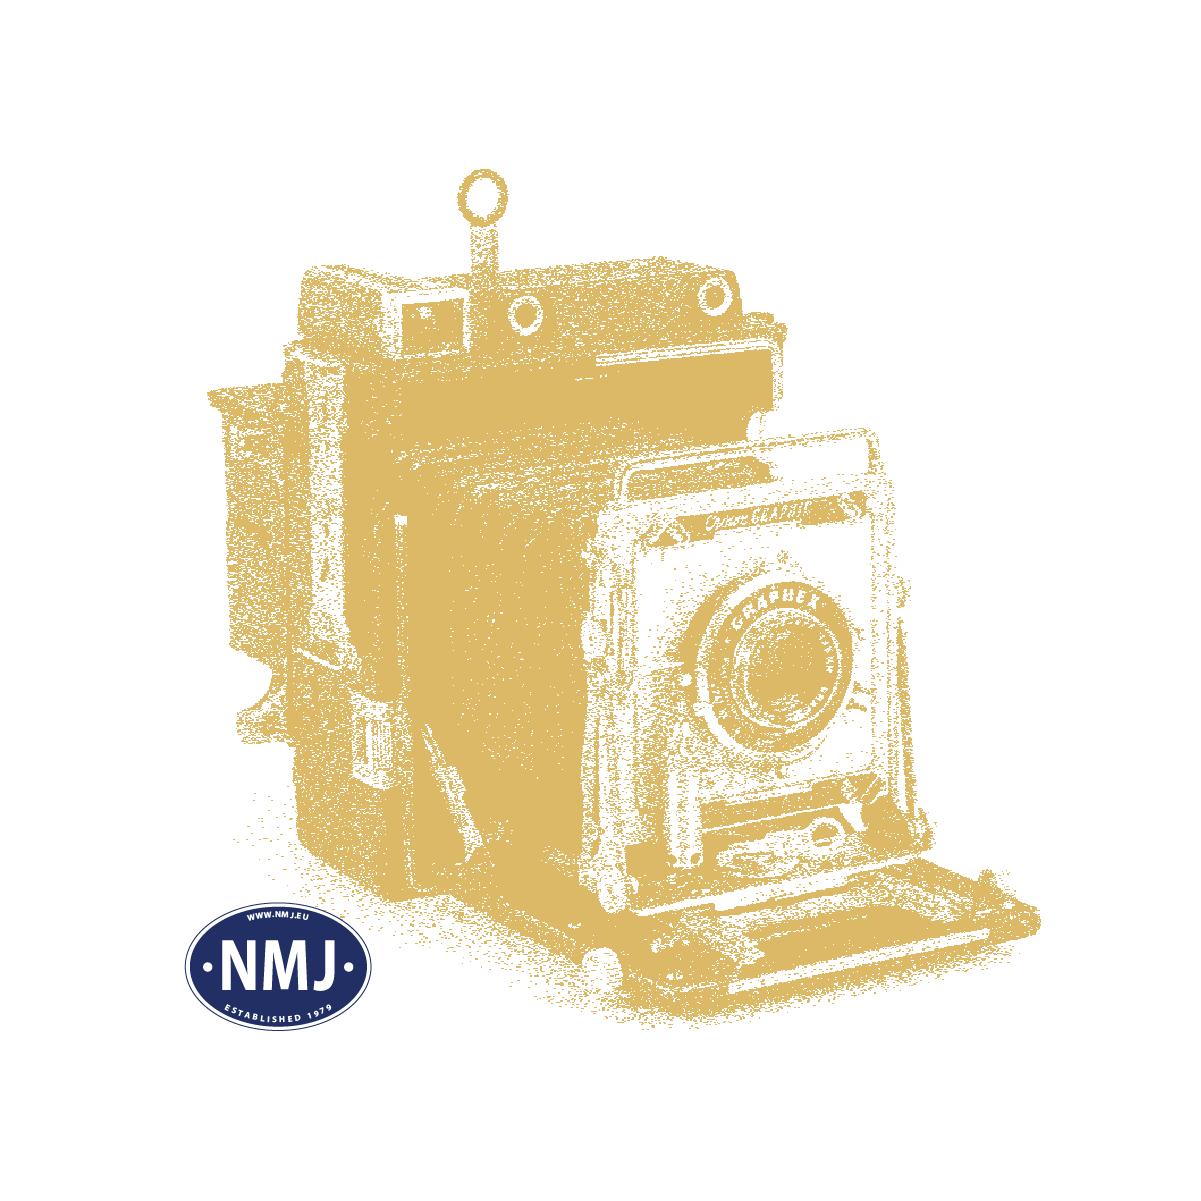 NMJT9936 - Komplett Hoved- & Lysprint for El11